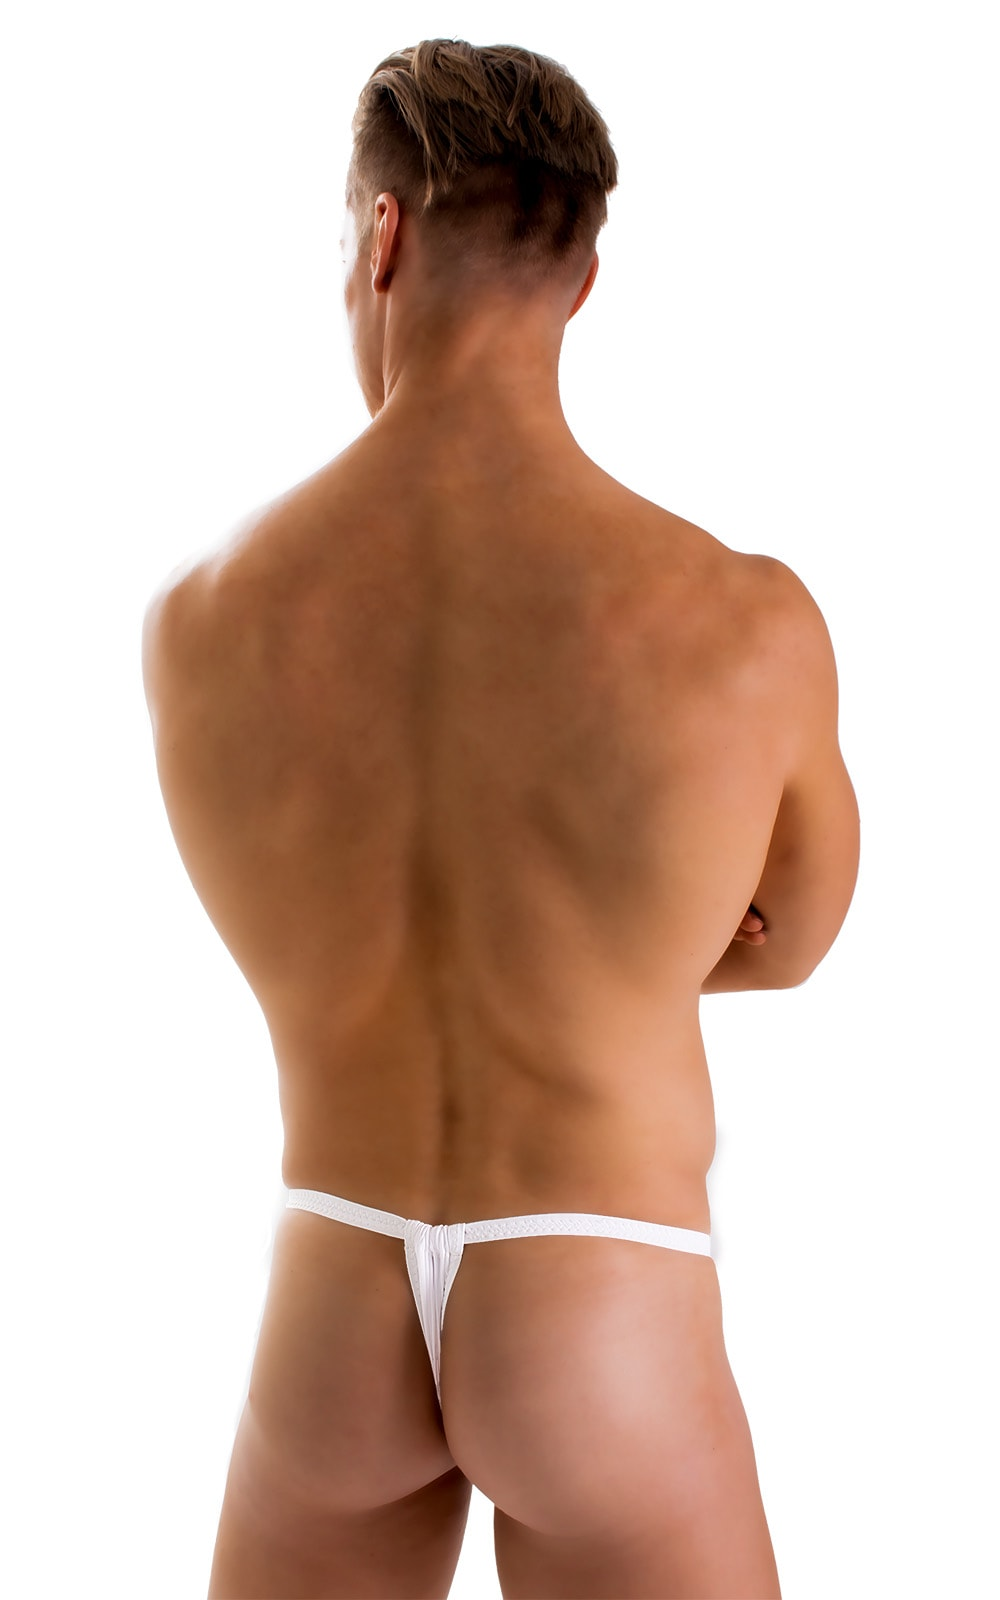 4-Way Adjustable Bikini-Tanga-Micro in Super ThinSKINZ White 4